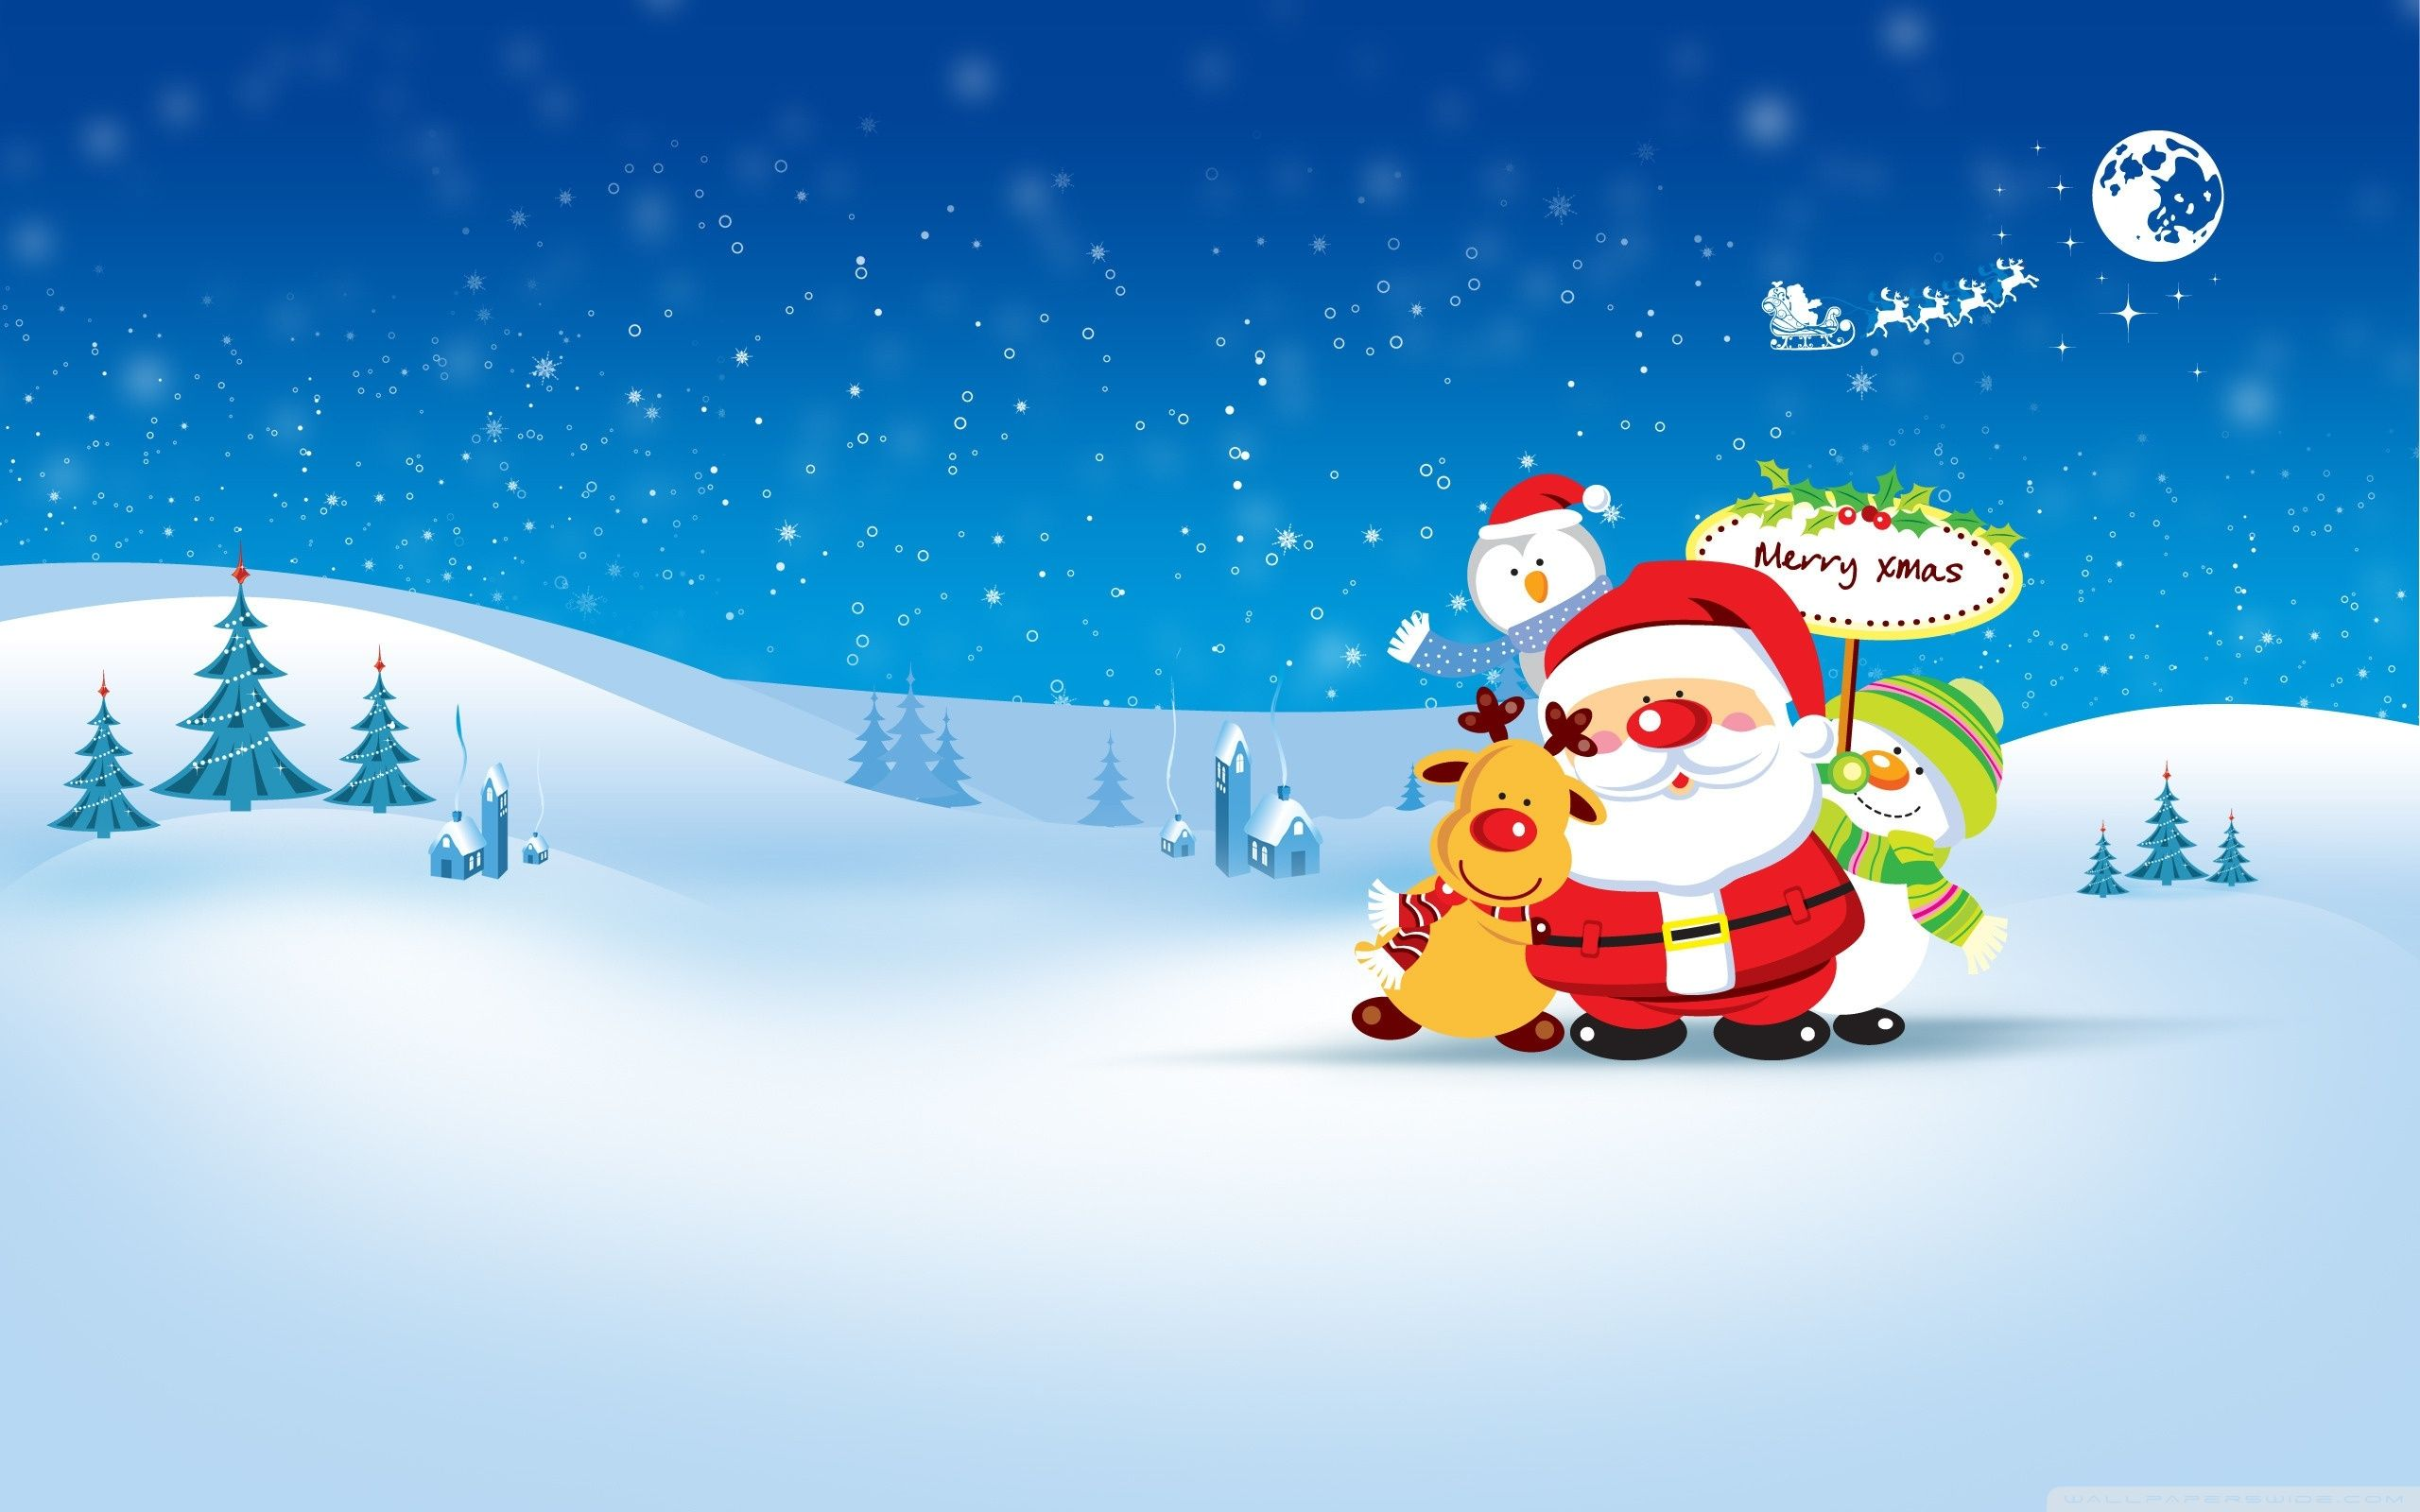 Merry Xmas ❤ 4k Hd Desktop Wallpaper For • Dual Monitor - Cute Christmas Desktop - HD Wallpaper